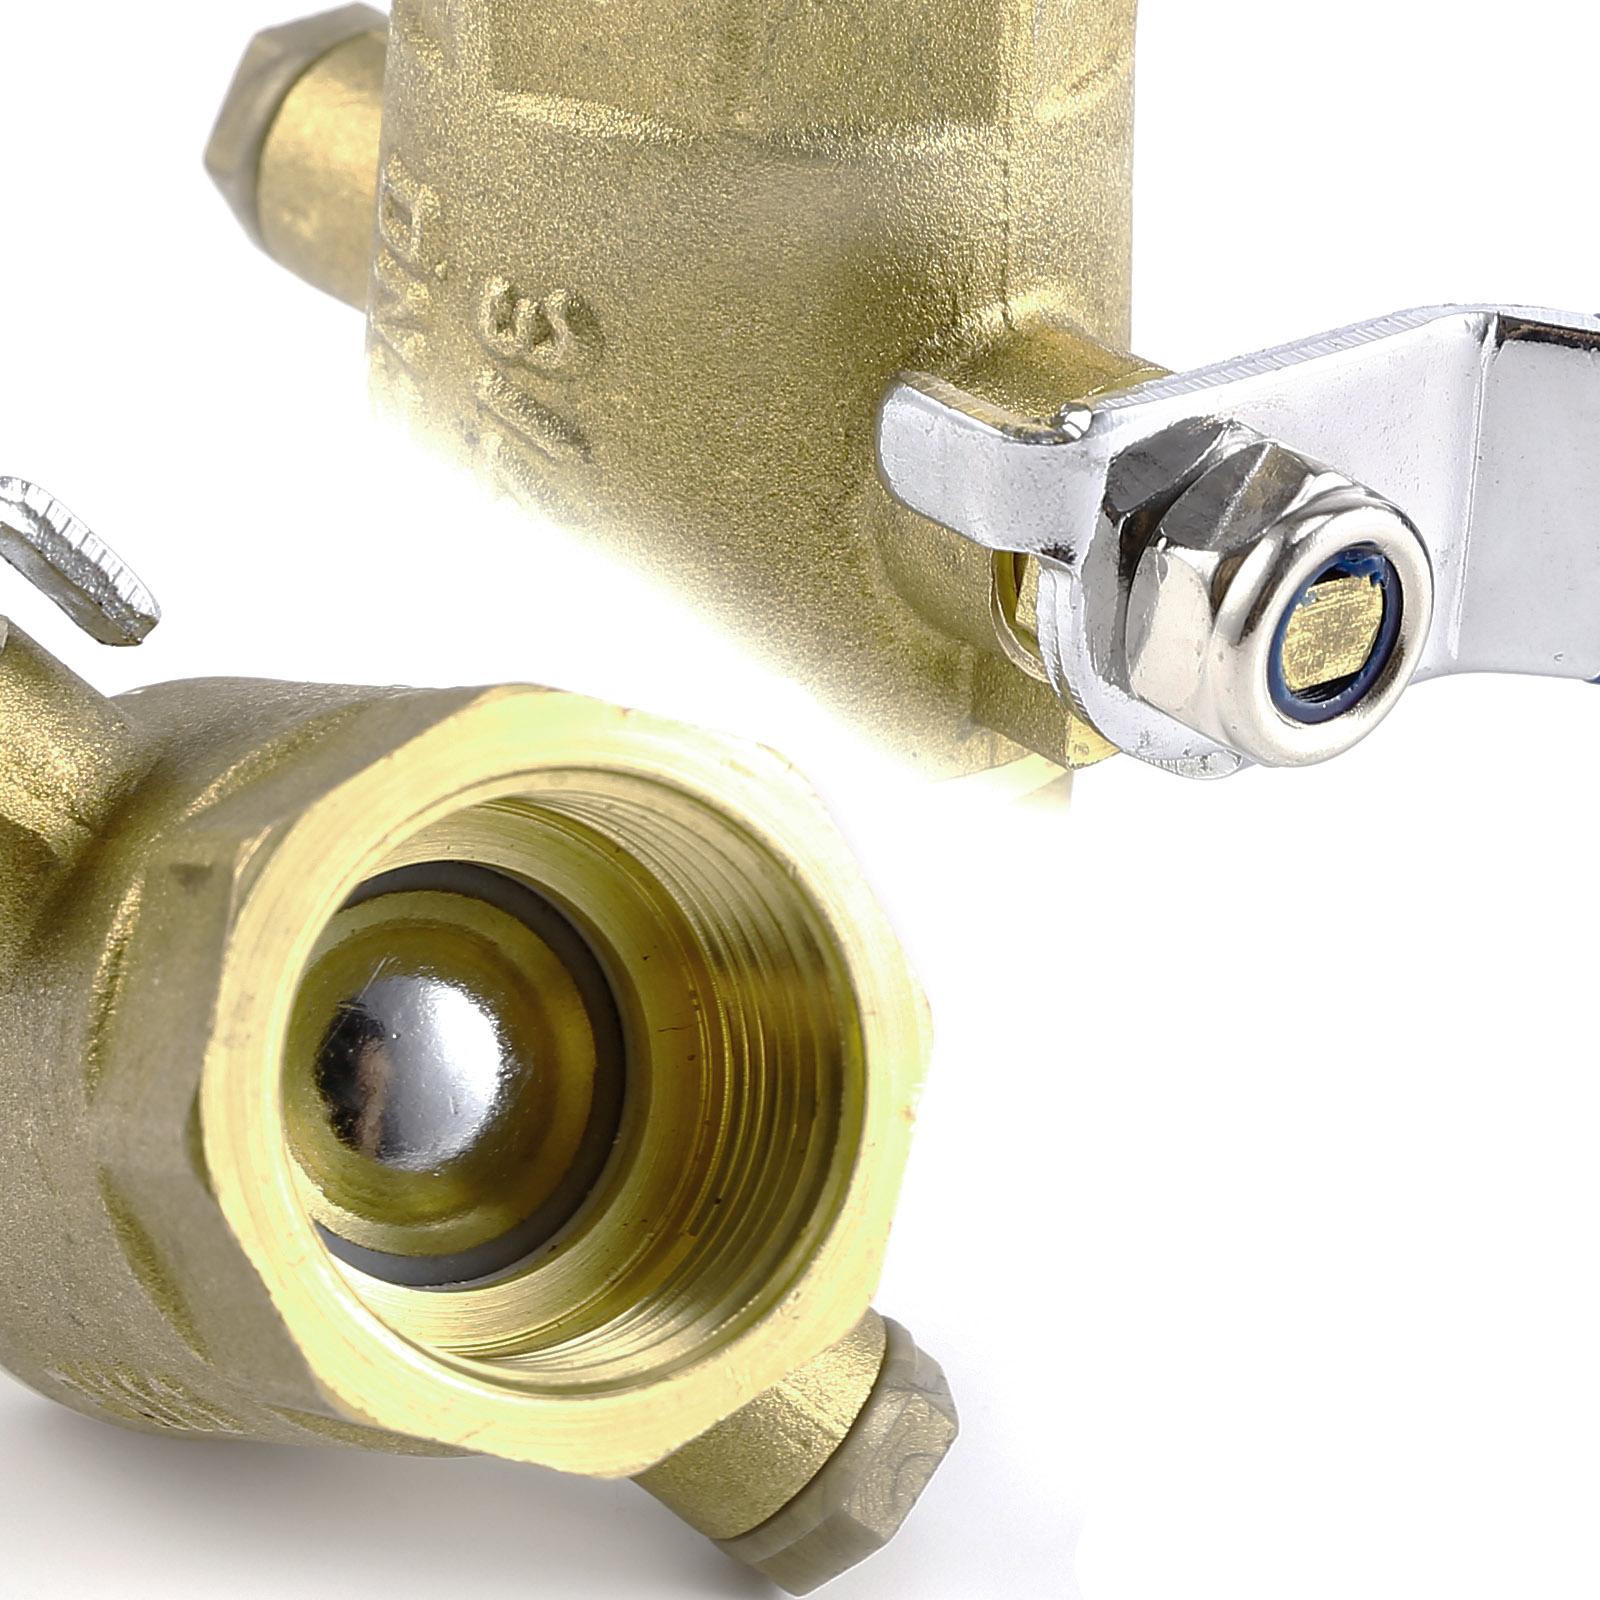 Brass lever ball shut off valve compression fitting gas